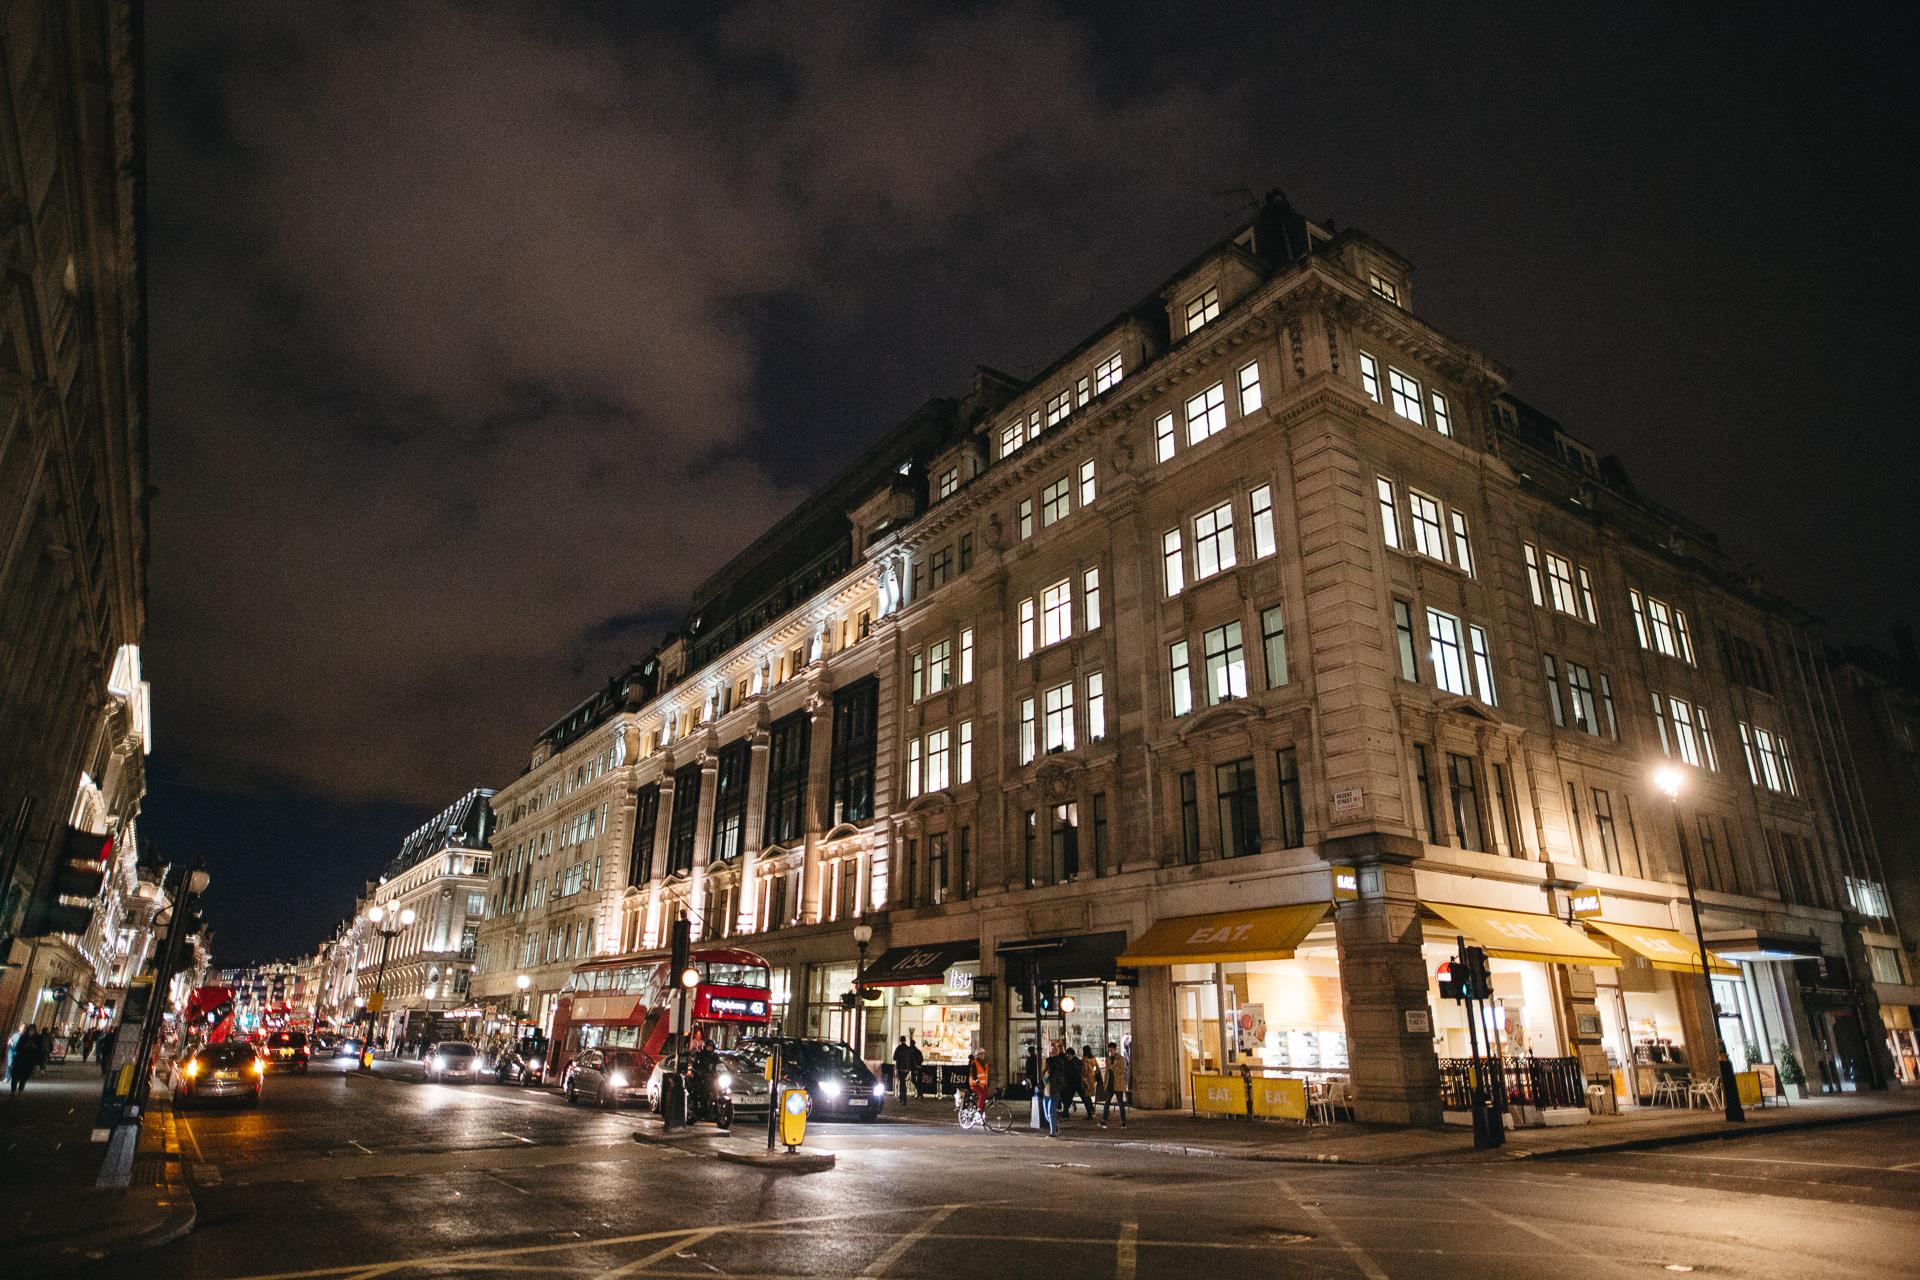 gabor_lenart_london_photographer_street_blogger_lifestyle_img_5127